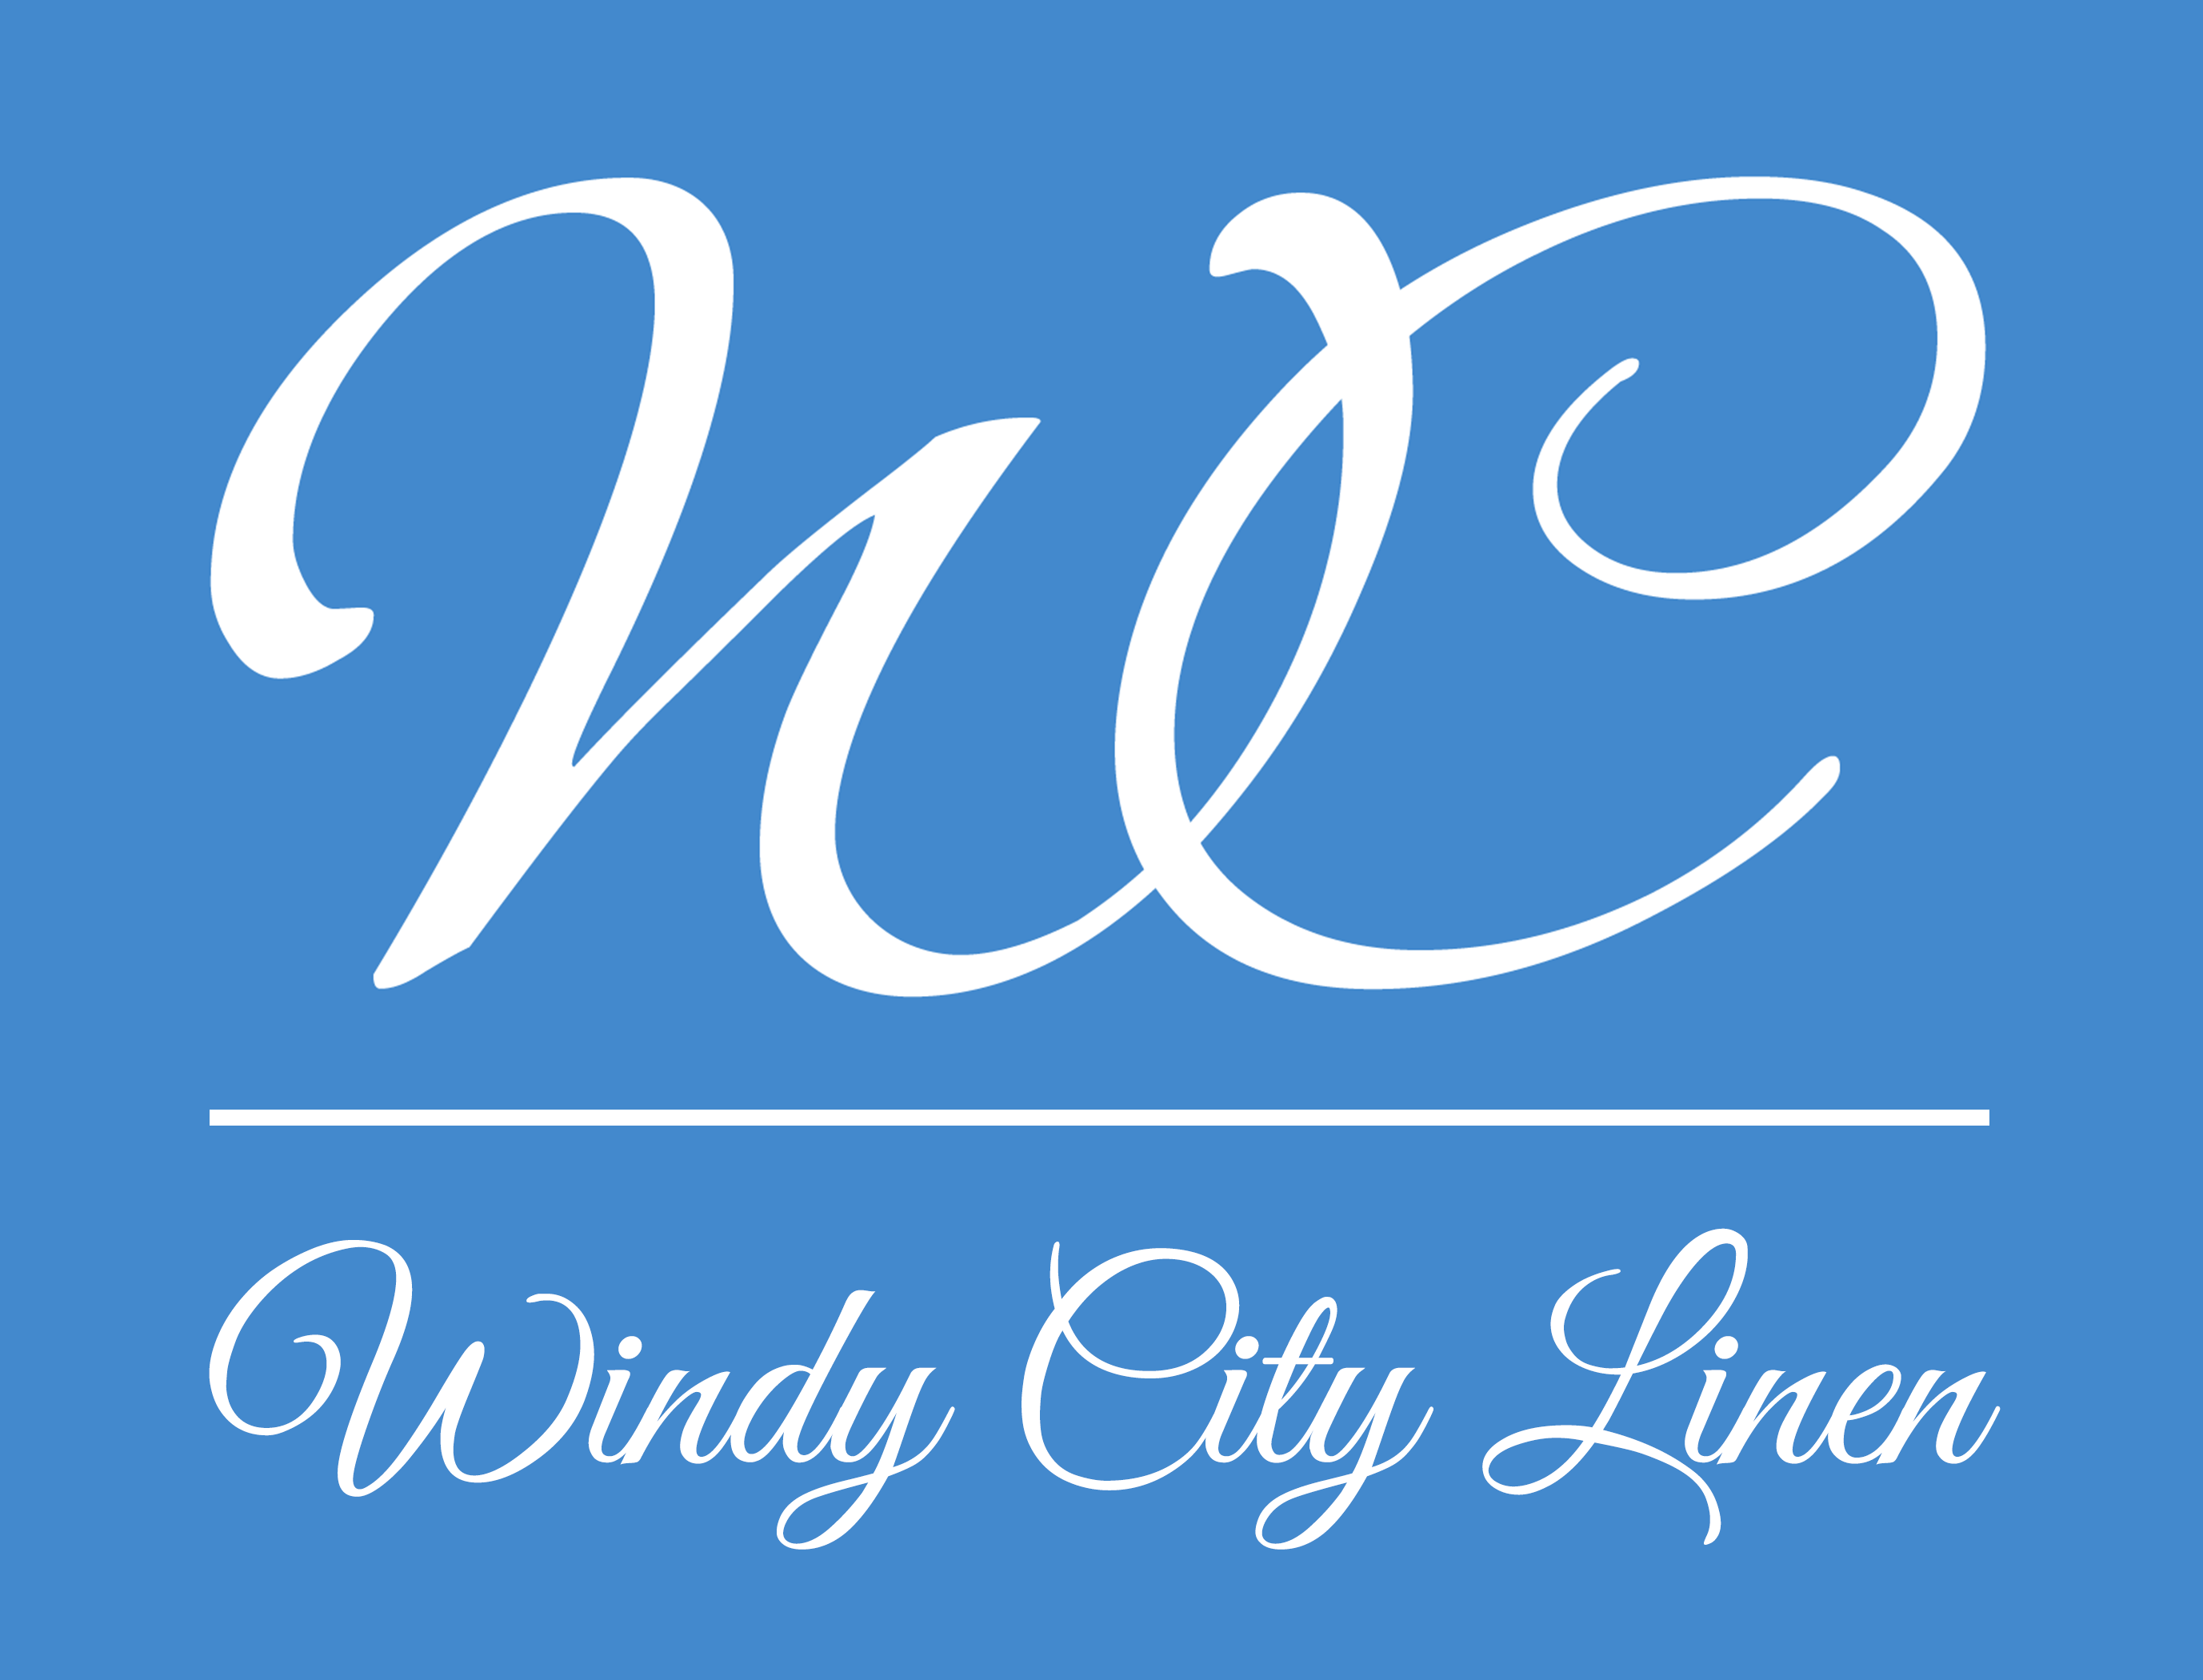 Windy City Linens